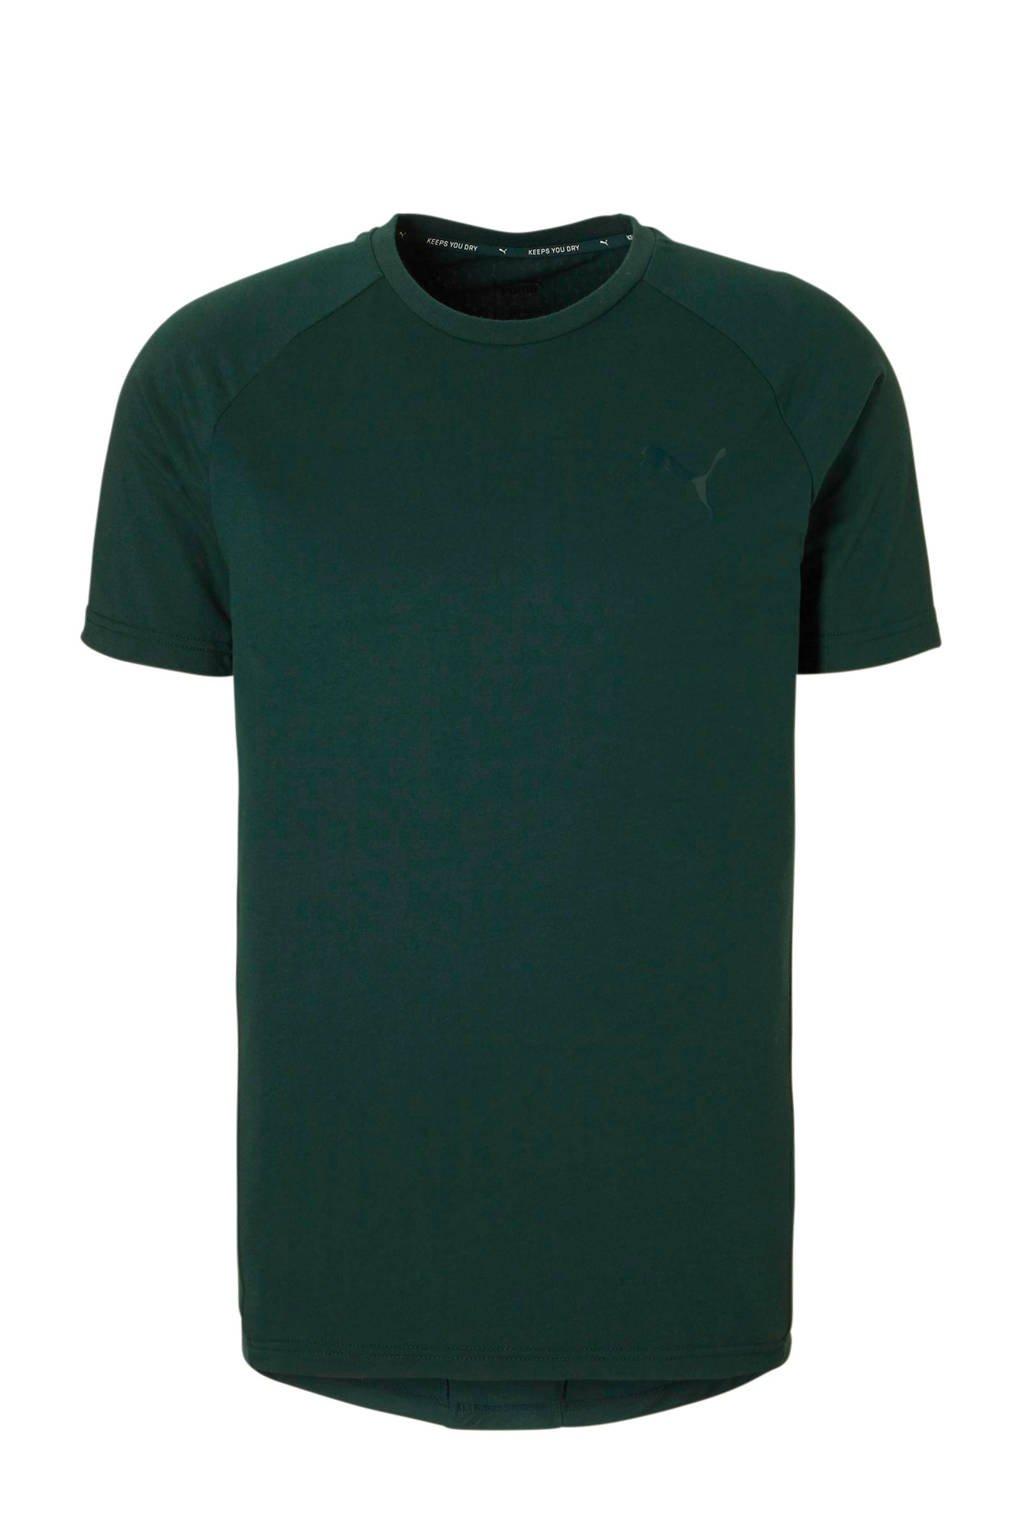 Puma   sport T-shirt donkergroen, Donkergroen